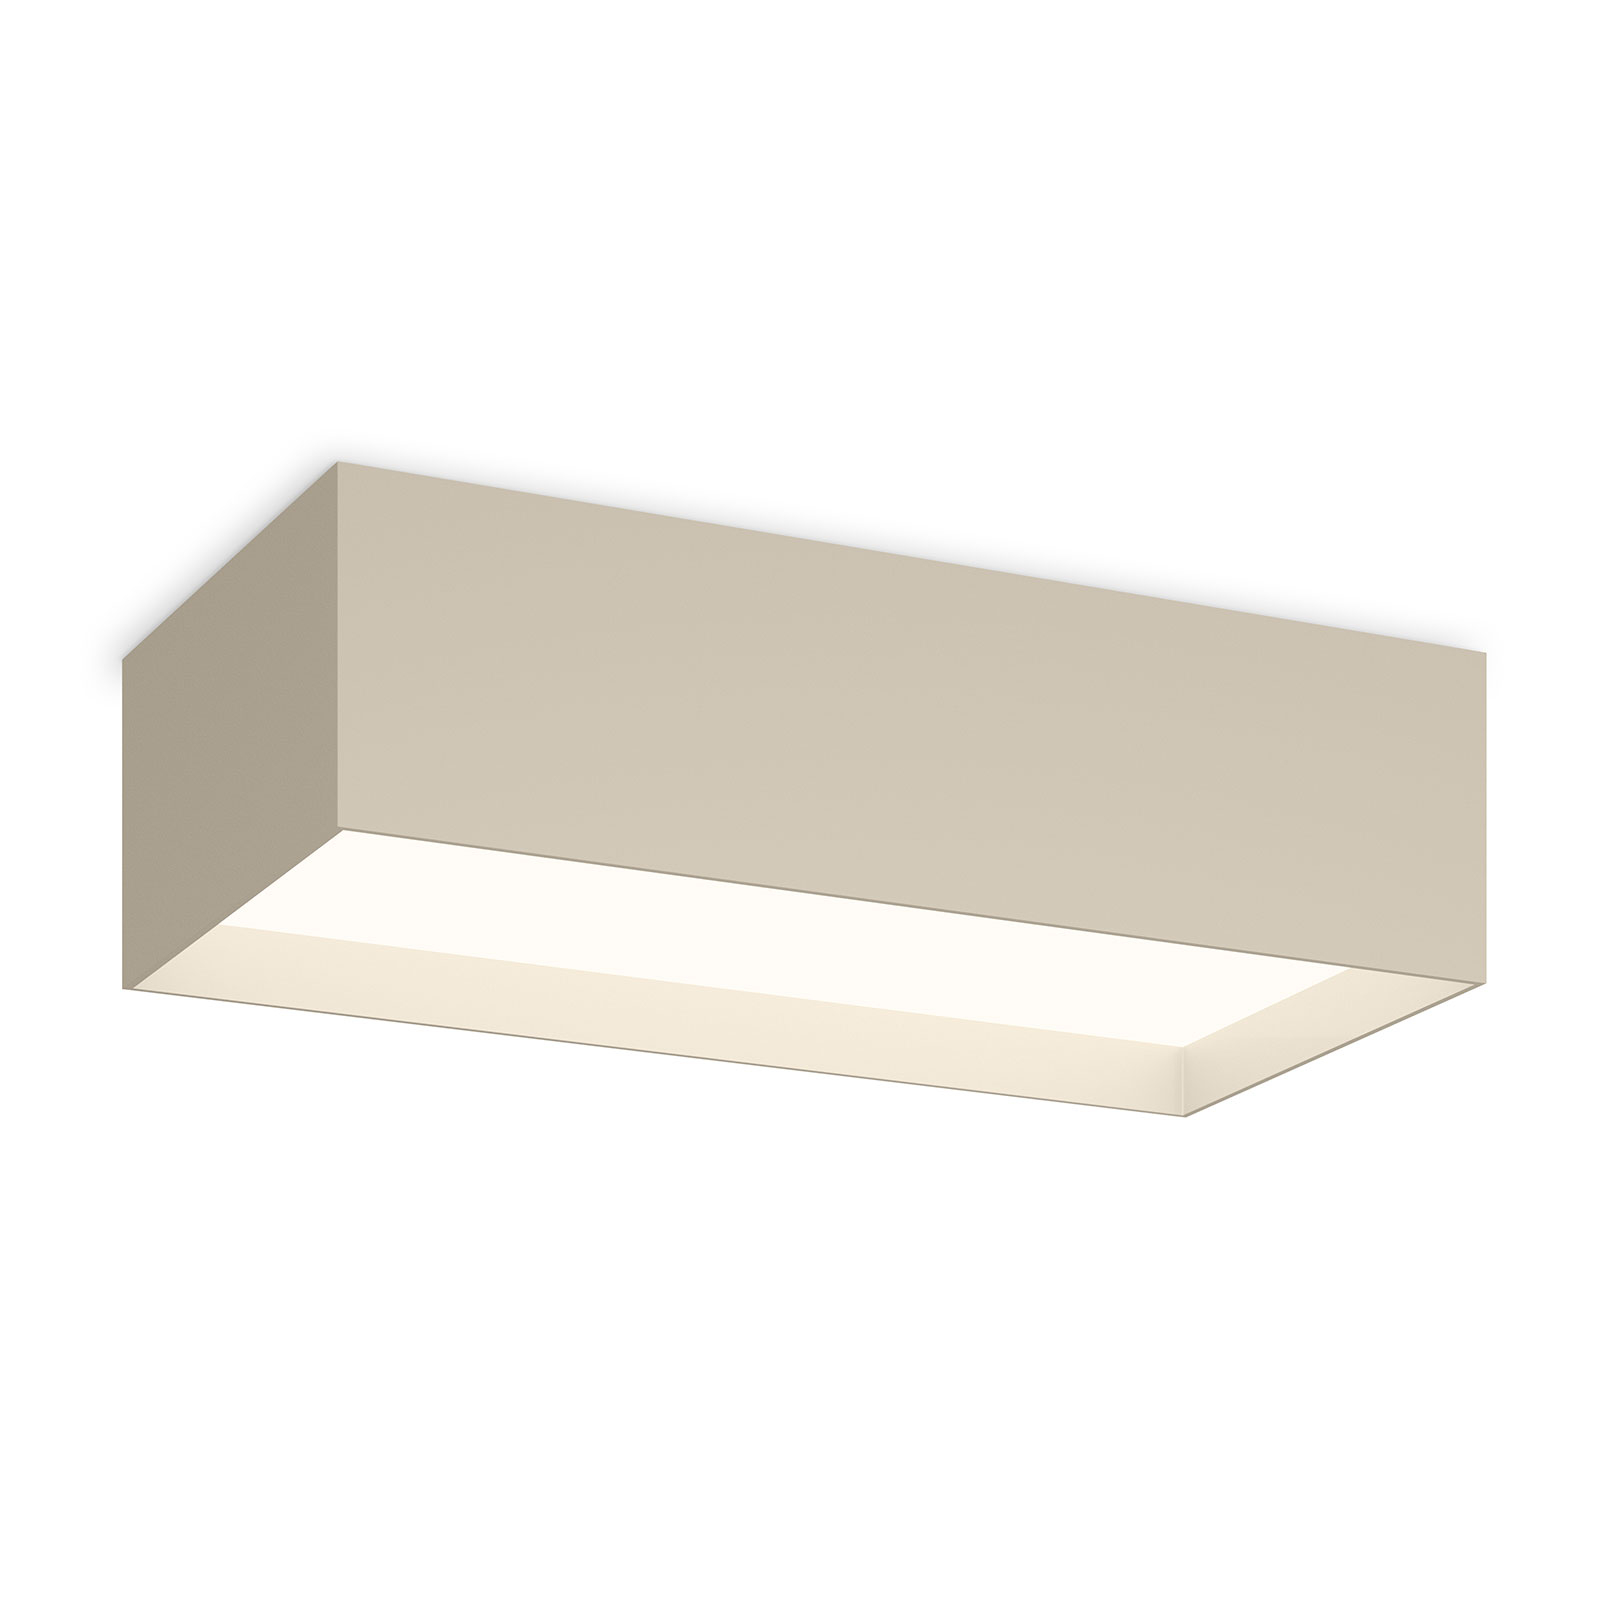 Vibia Structural 2634 lampa sufitowa 48cm, szara